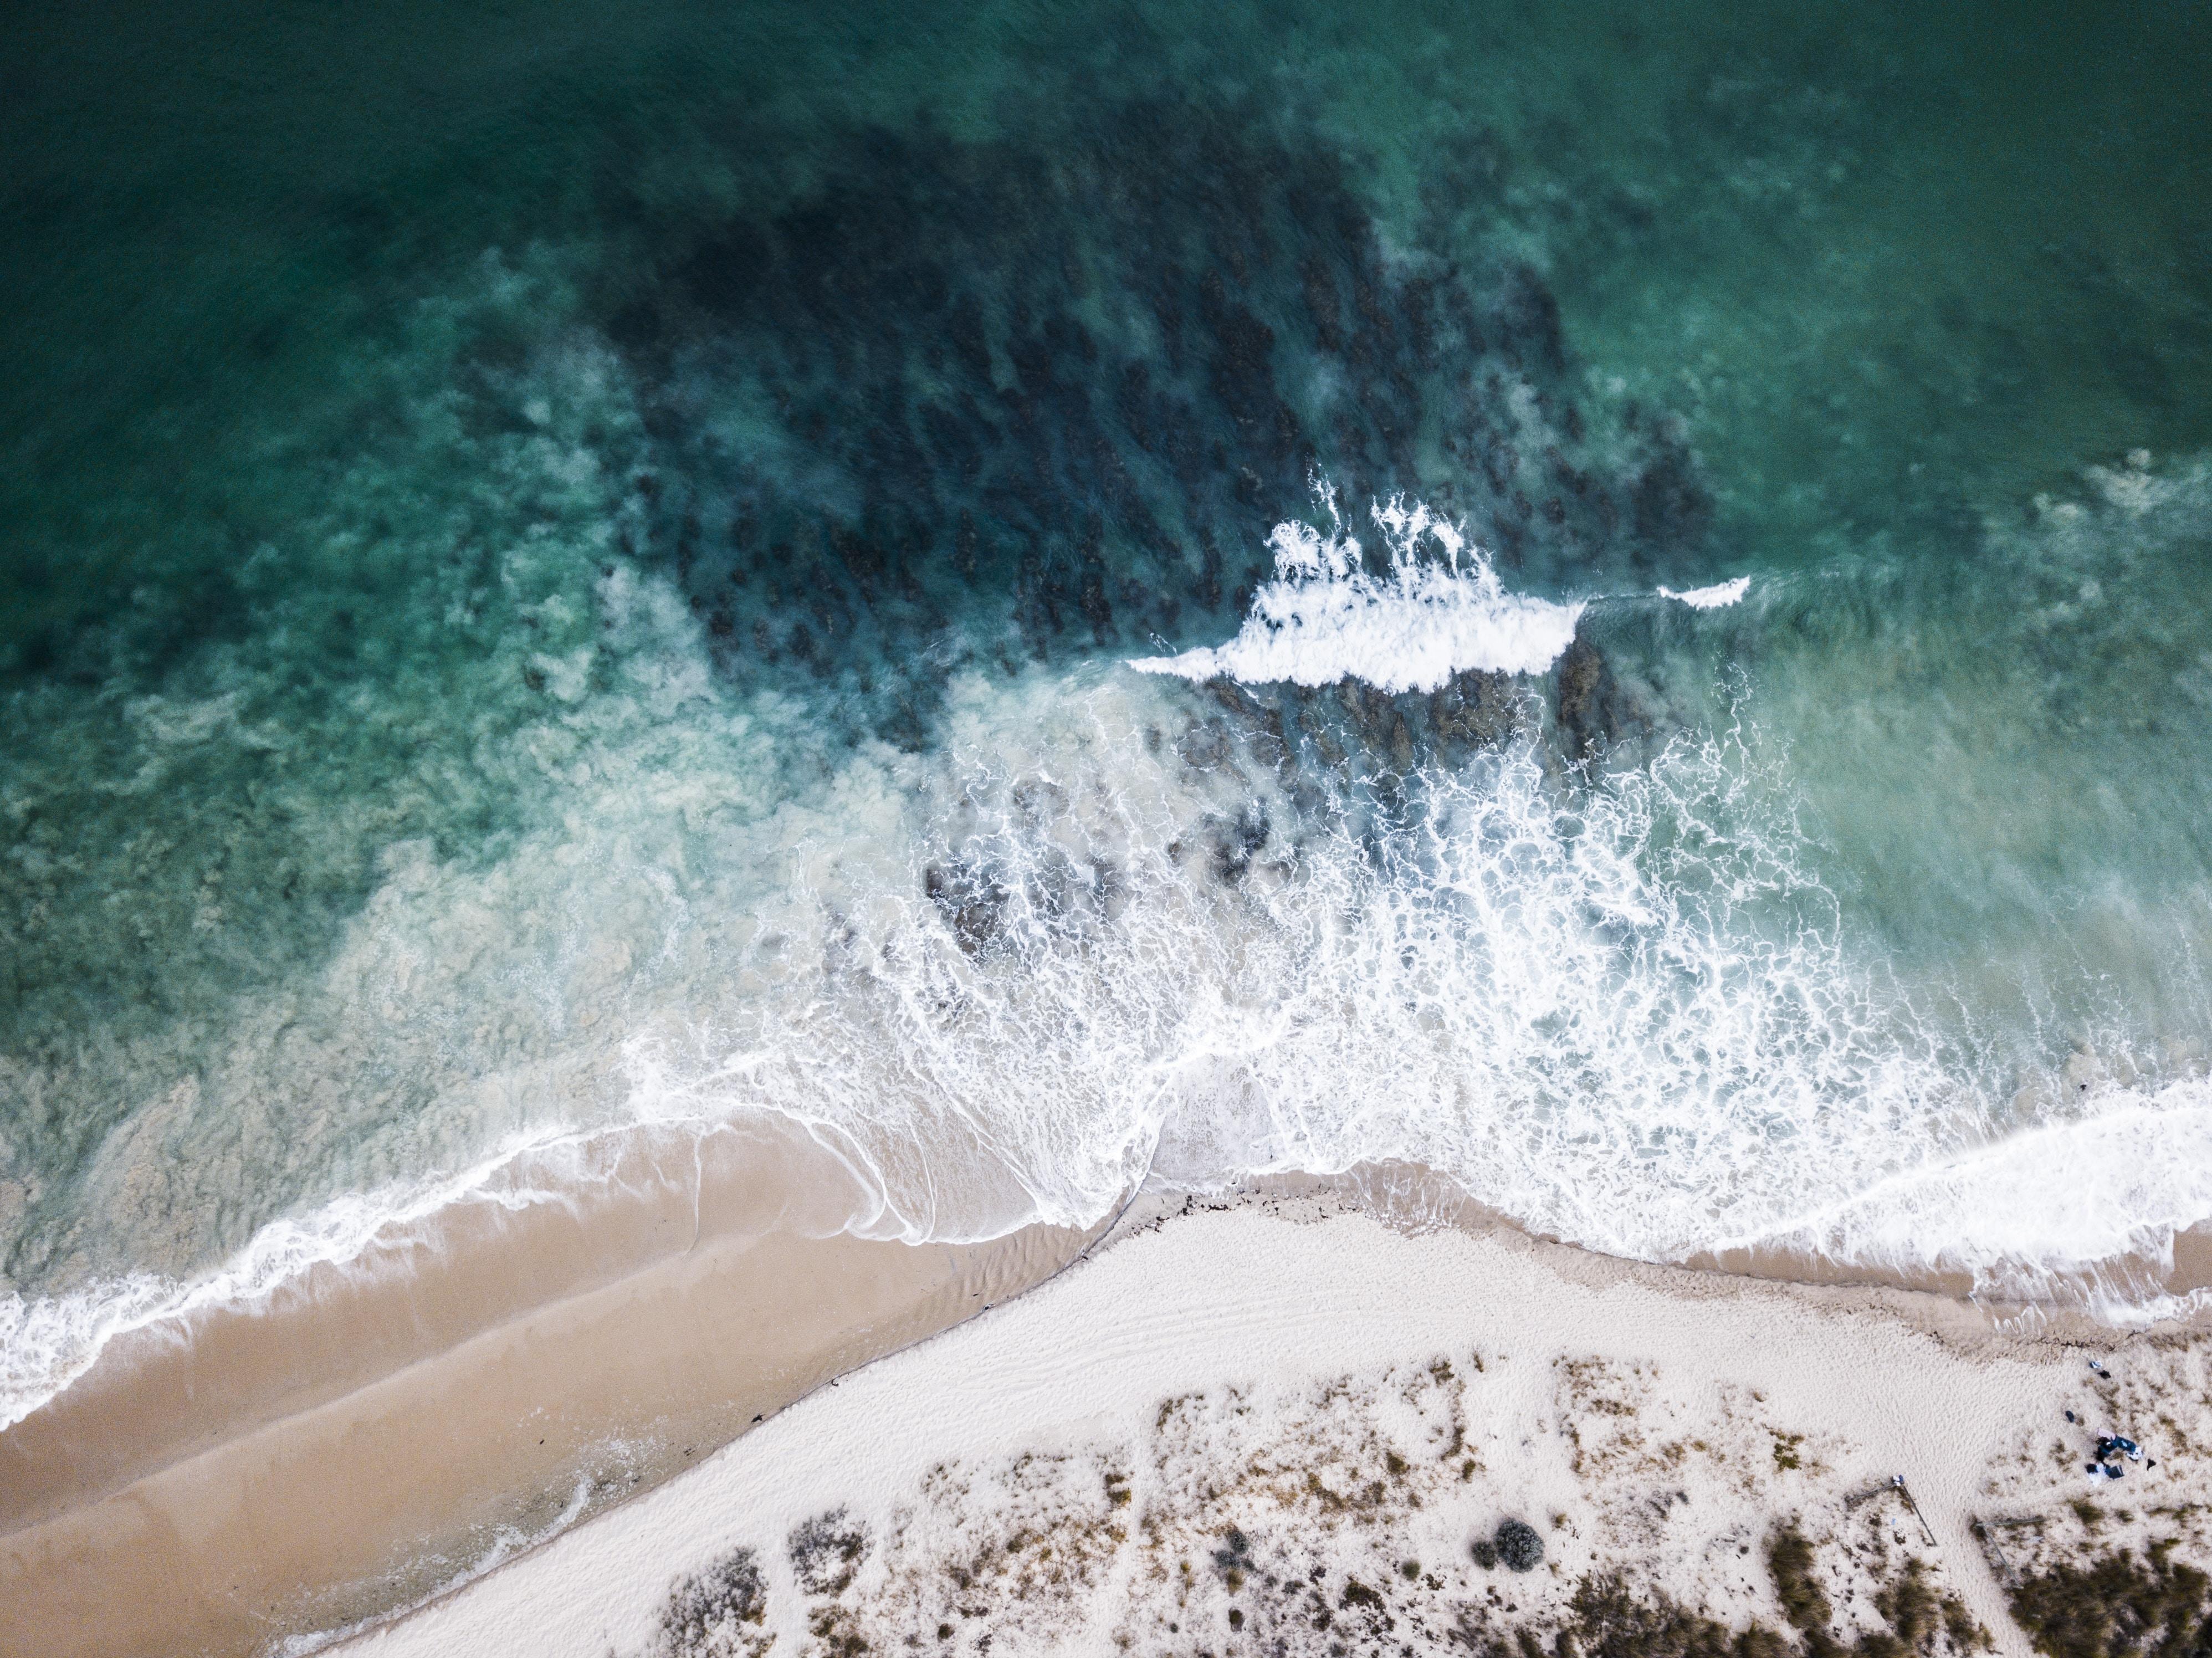 high-angle photo of ocean waves crashing on shore